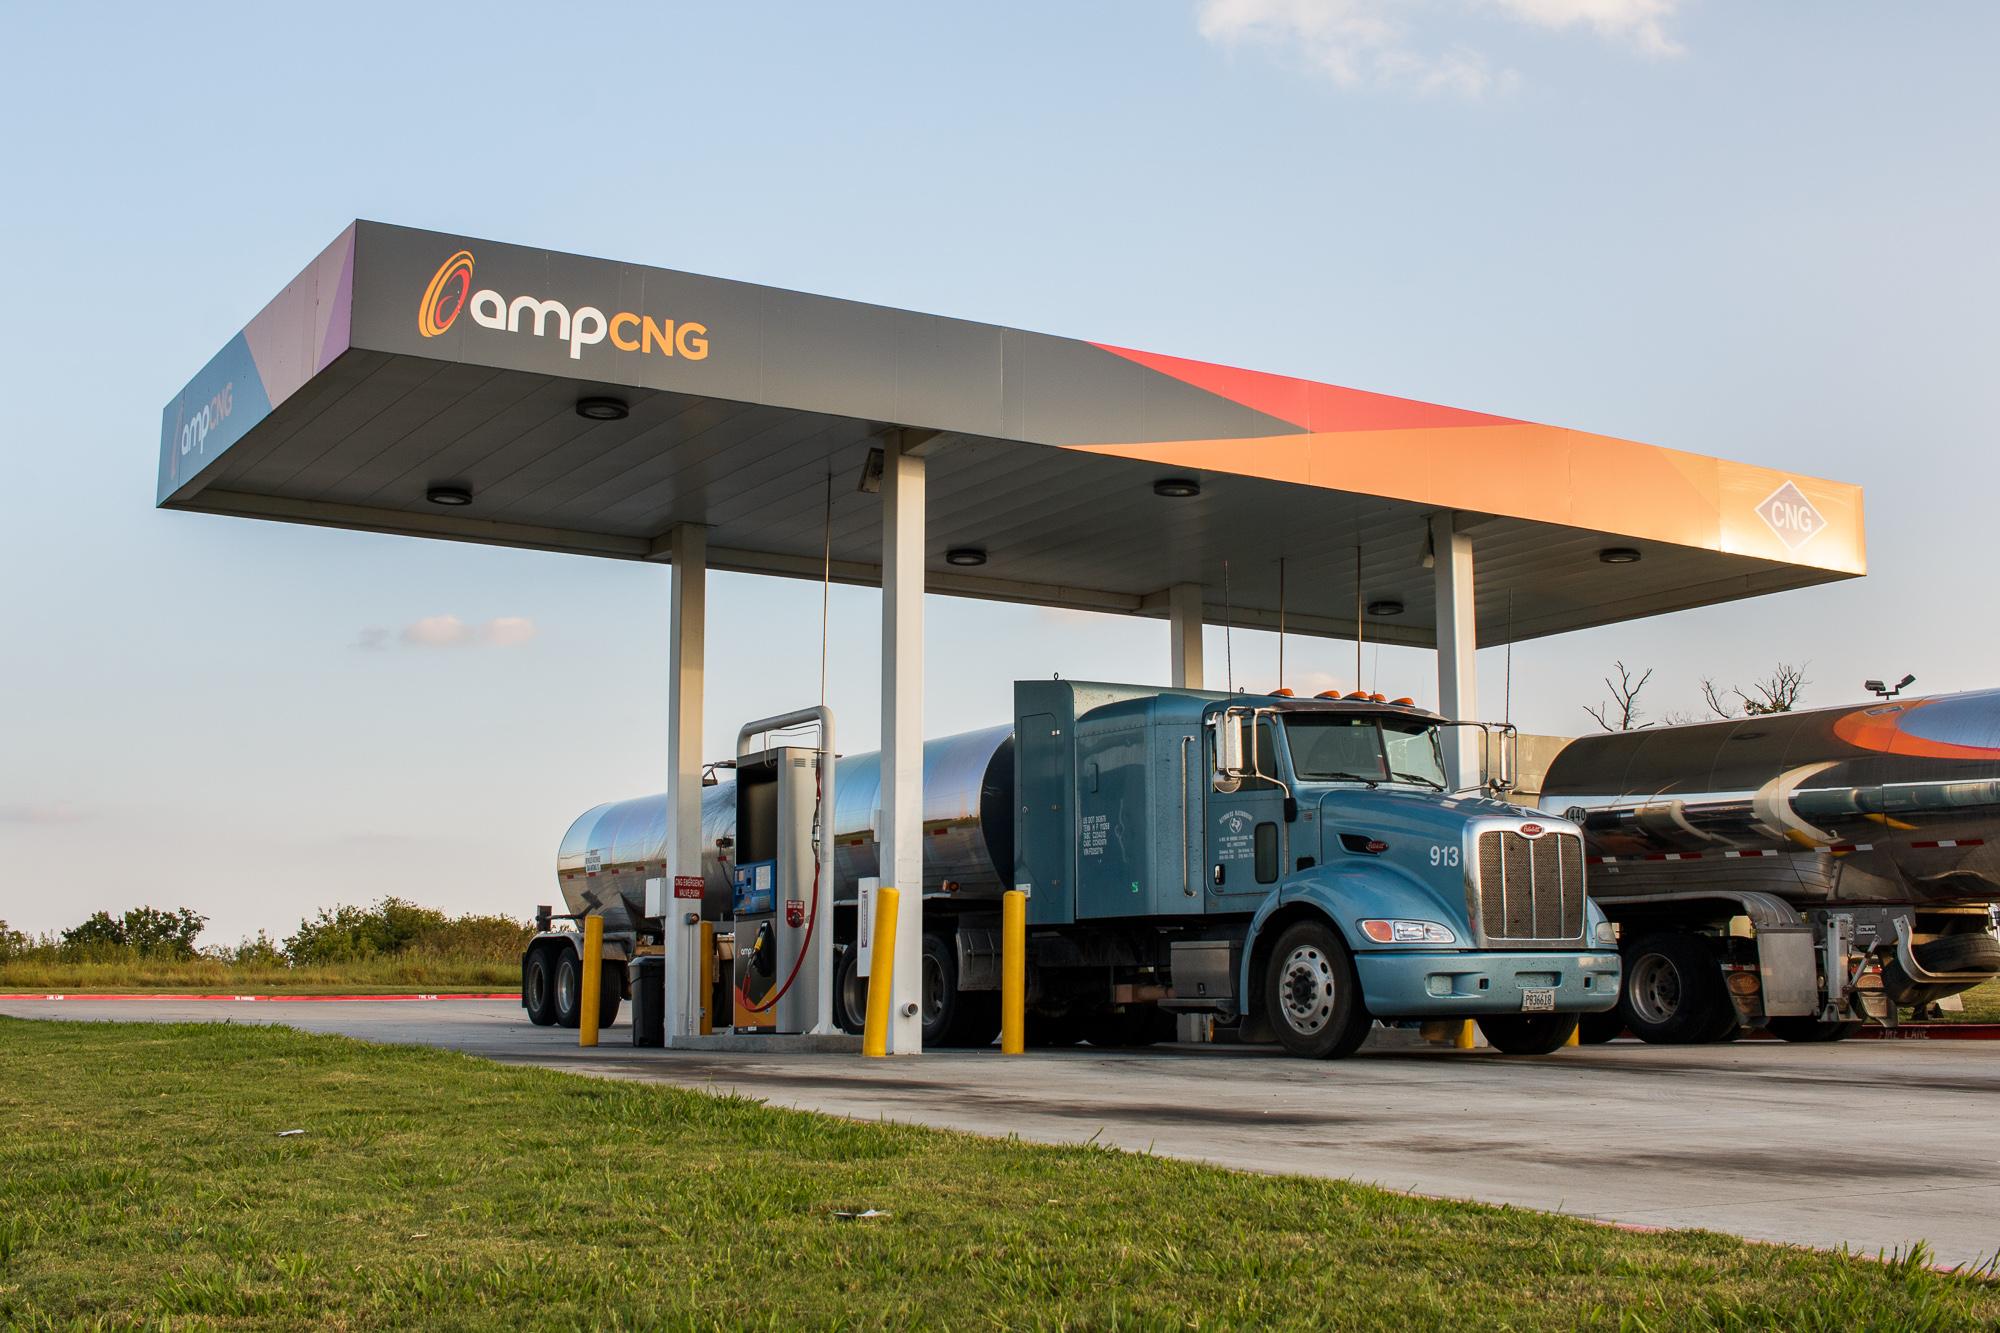 waco with trucks.jpg